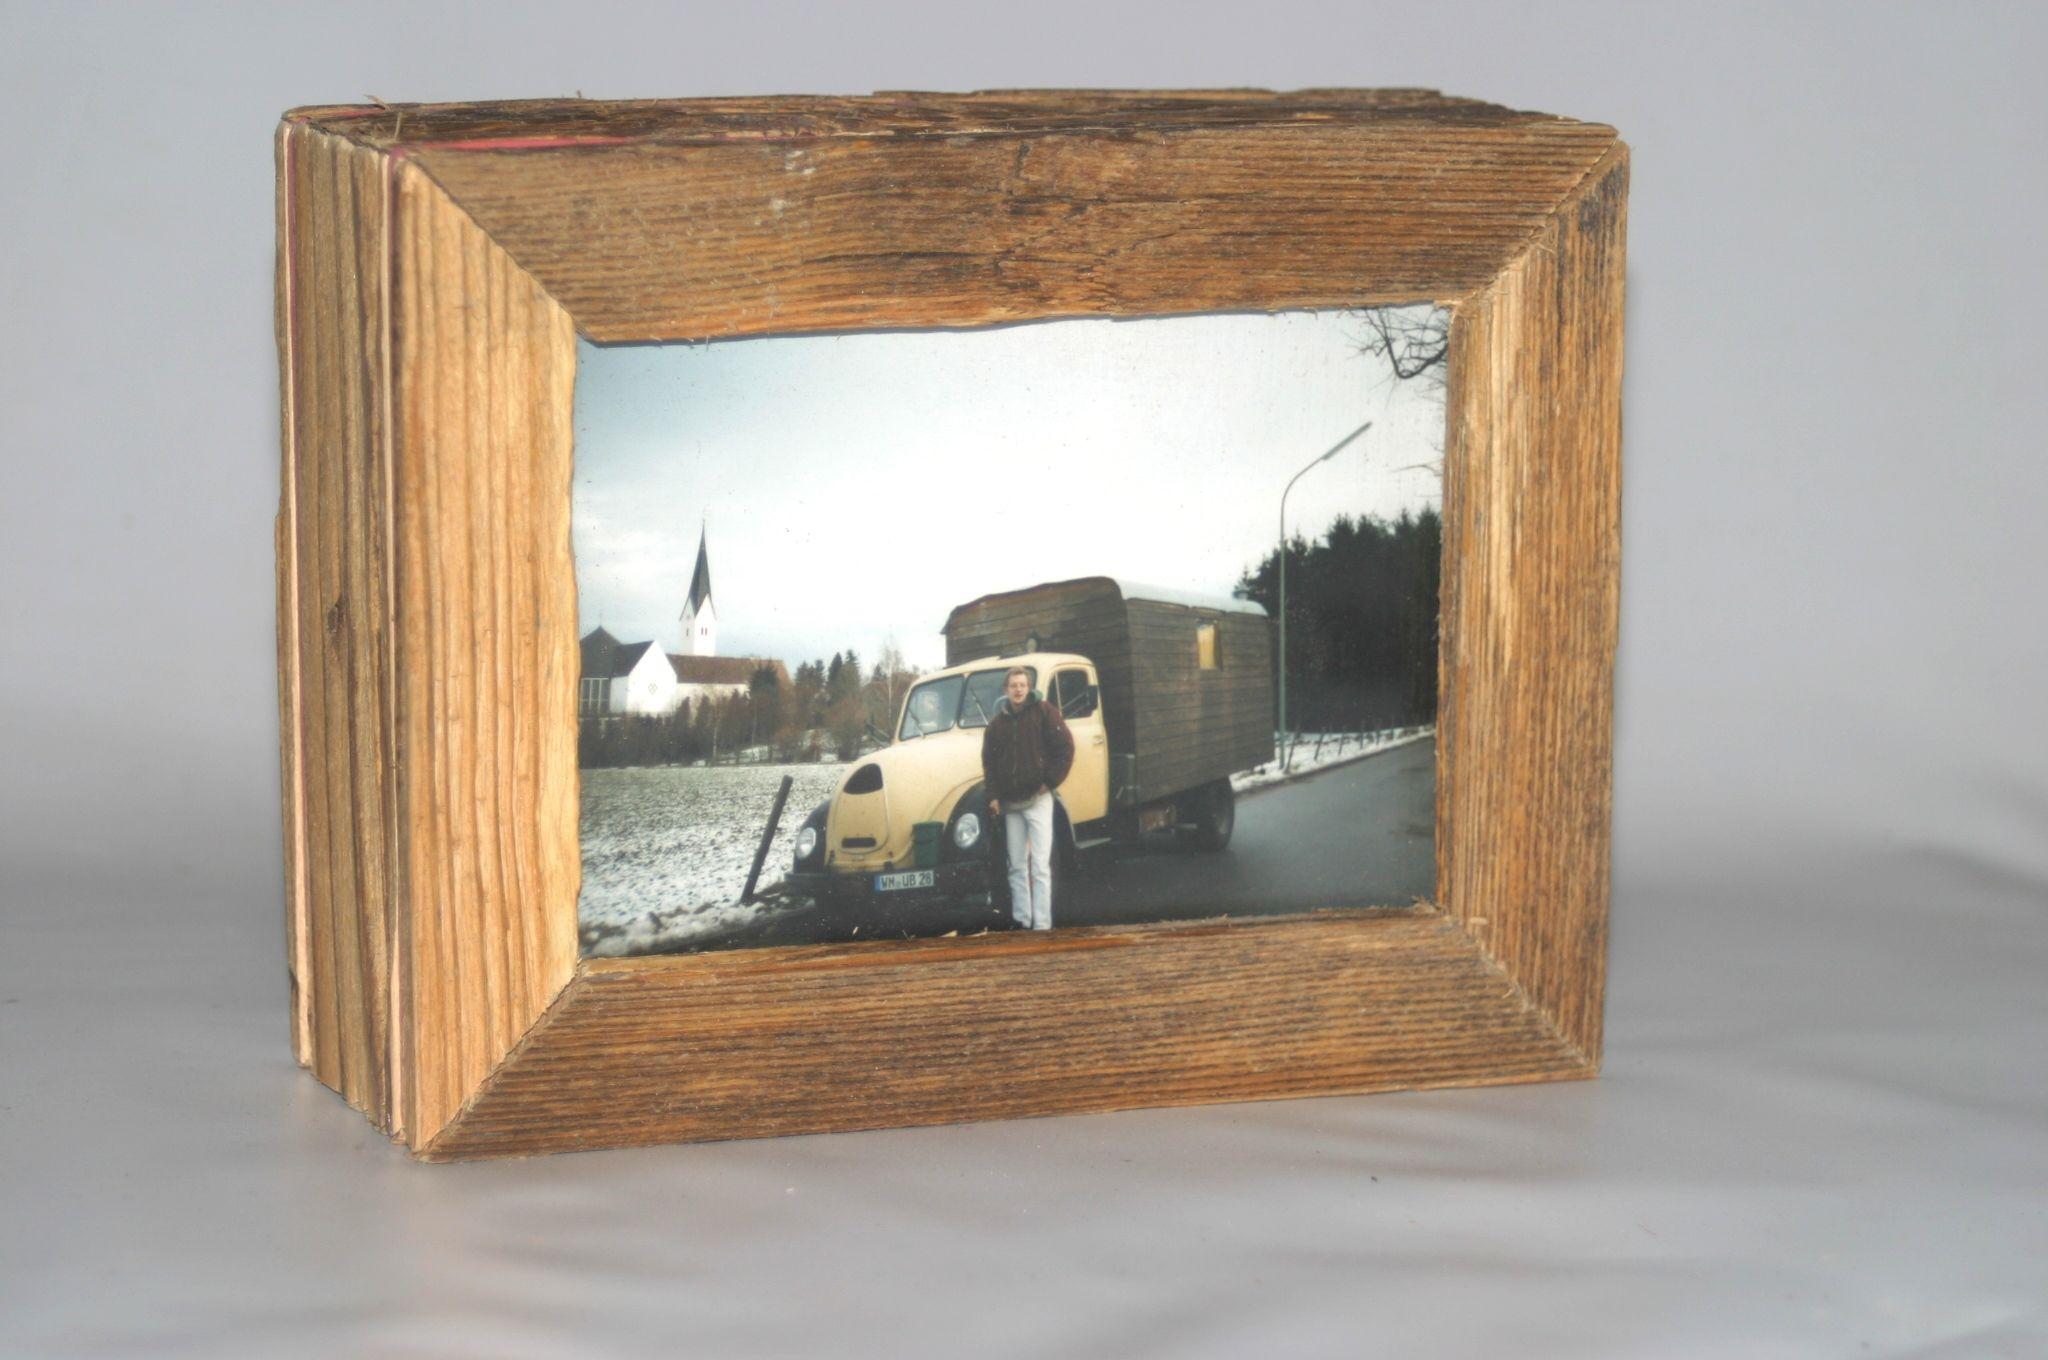 altholz bilderrahmen upcycling landhaus fotorahmen standrahmen 9 x 13 vintage ebay. Black Bedroom Furniture Sets. Home Design Ideas